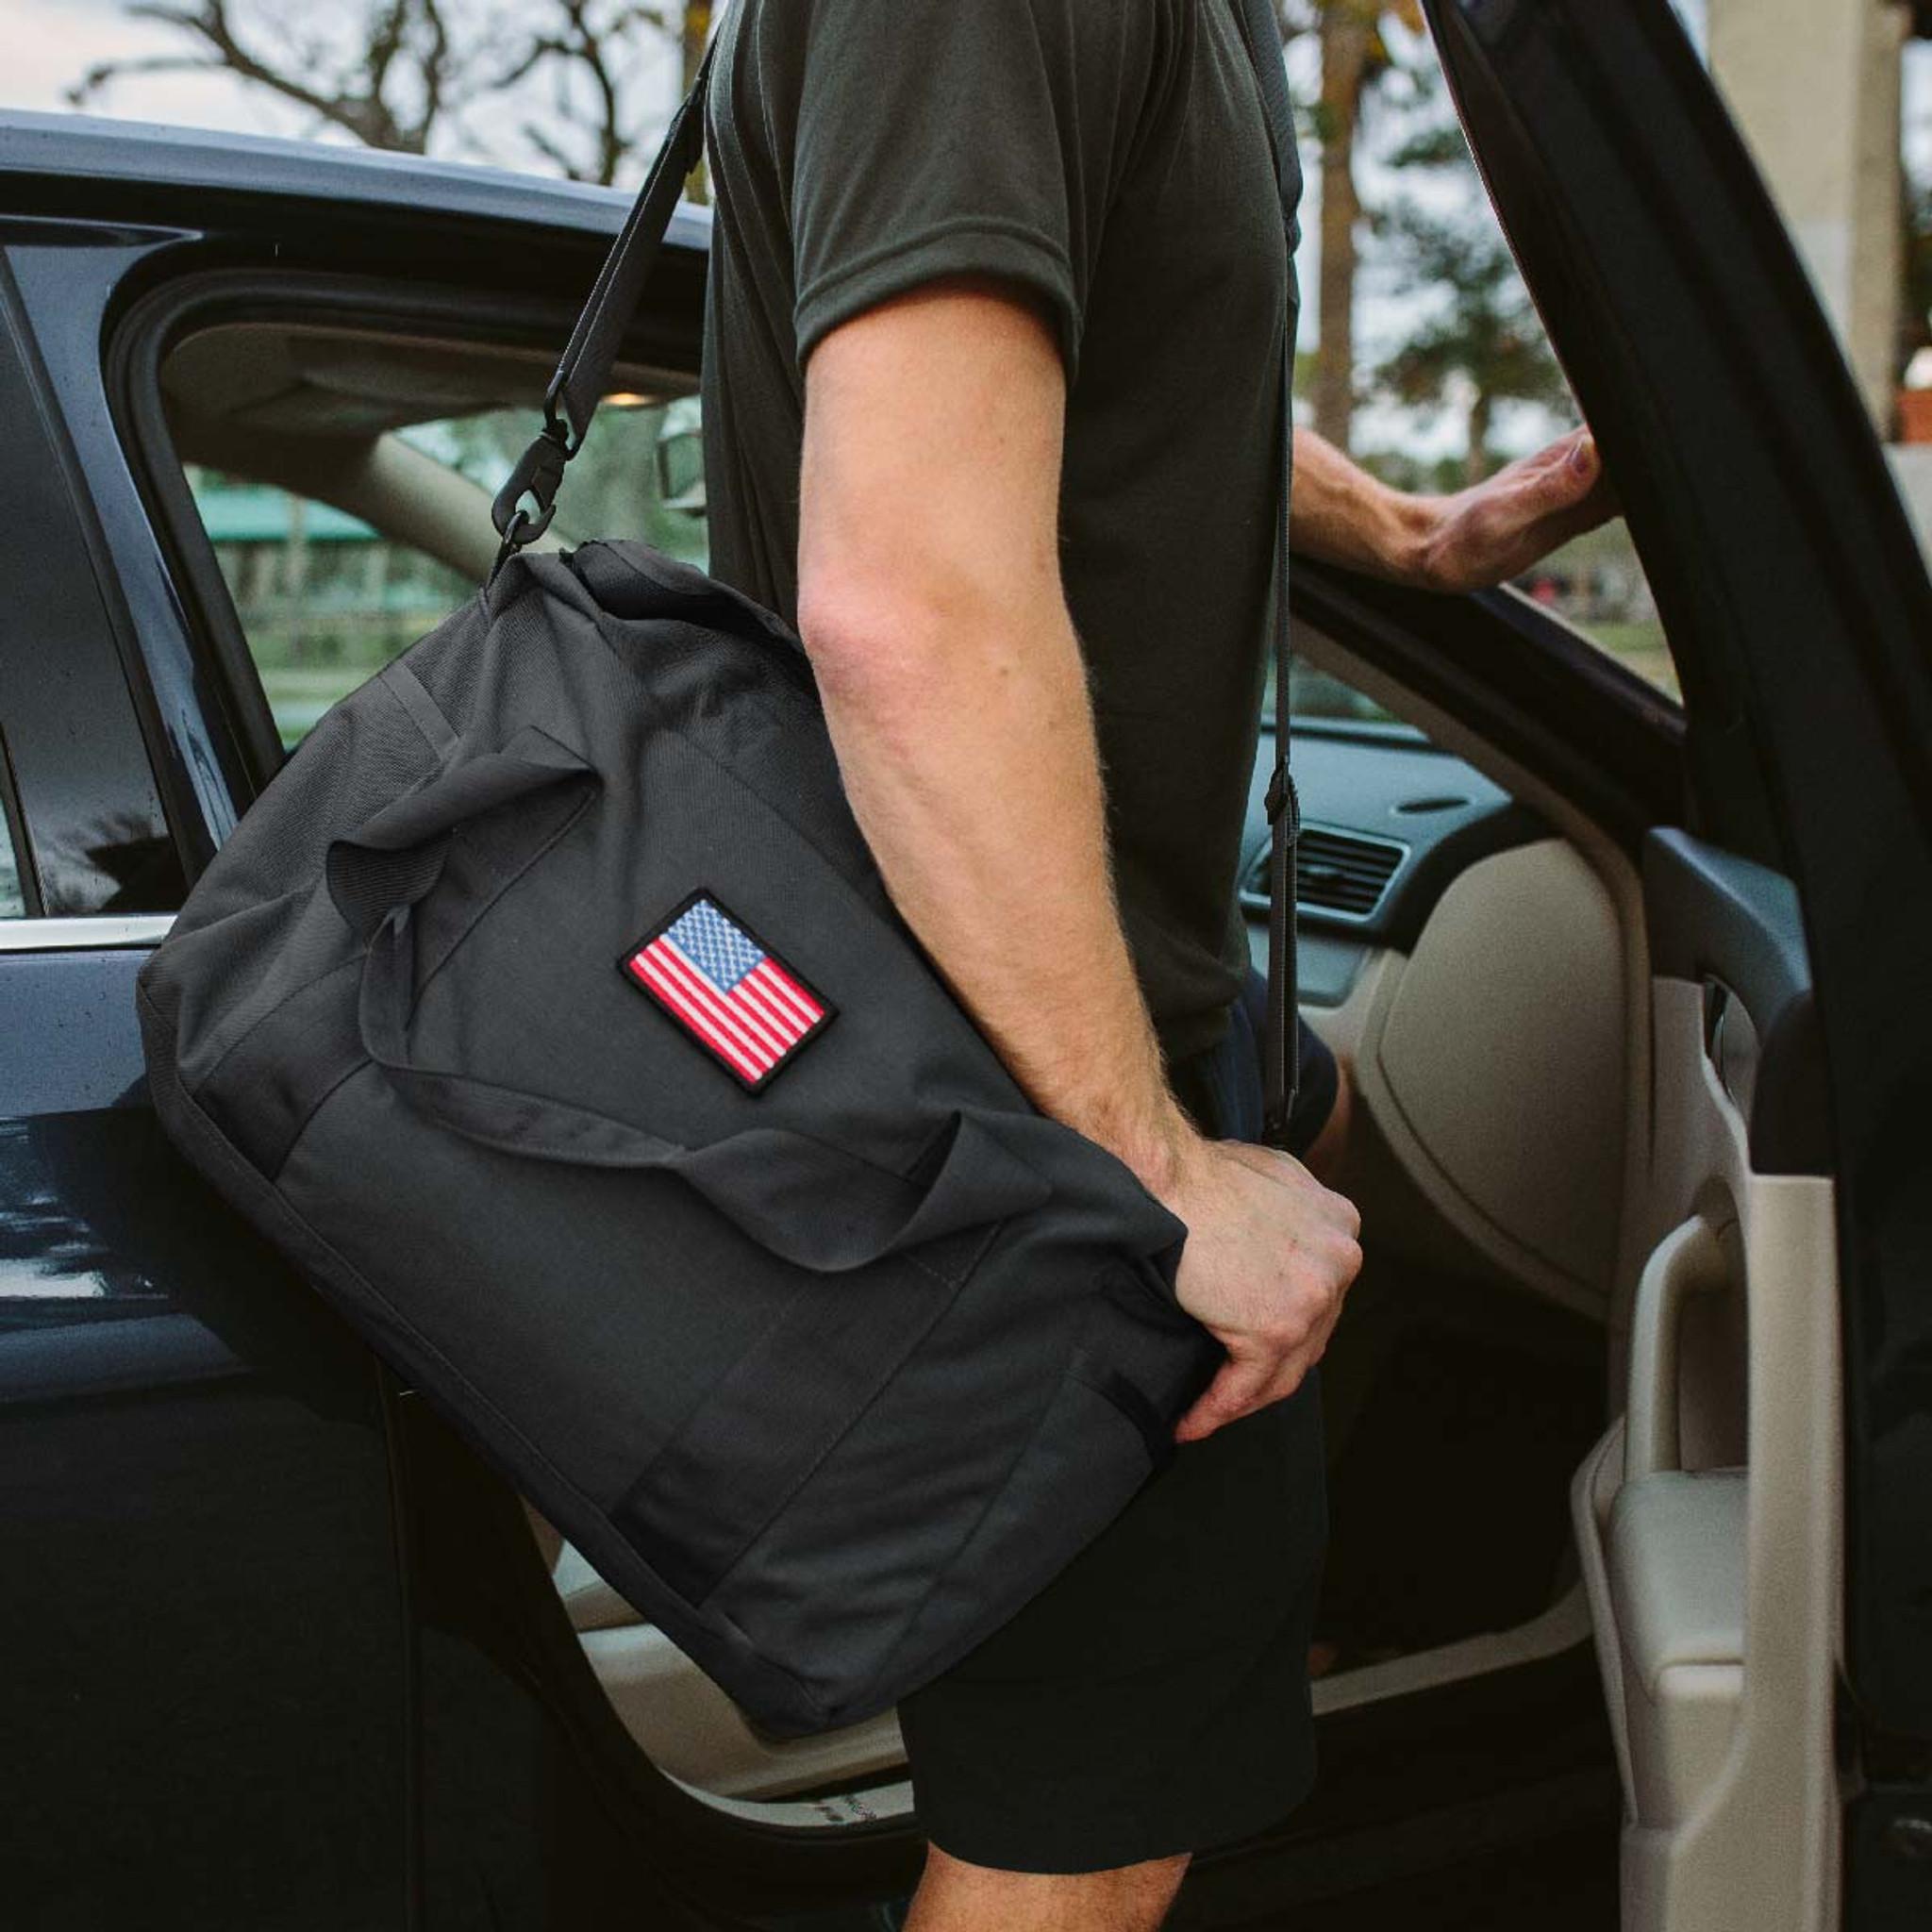 d1587b20f9 Kit Bag - GORUCK